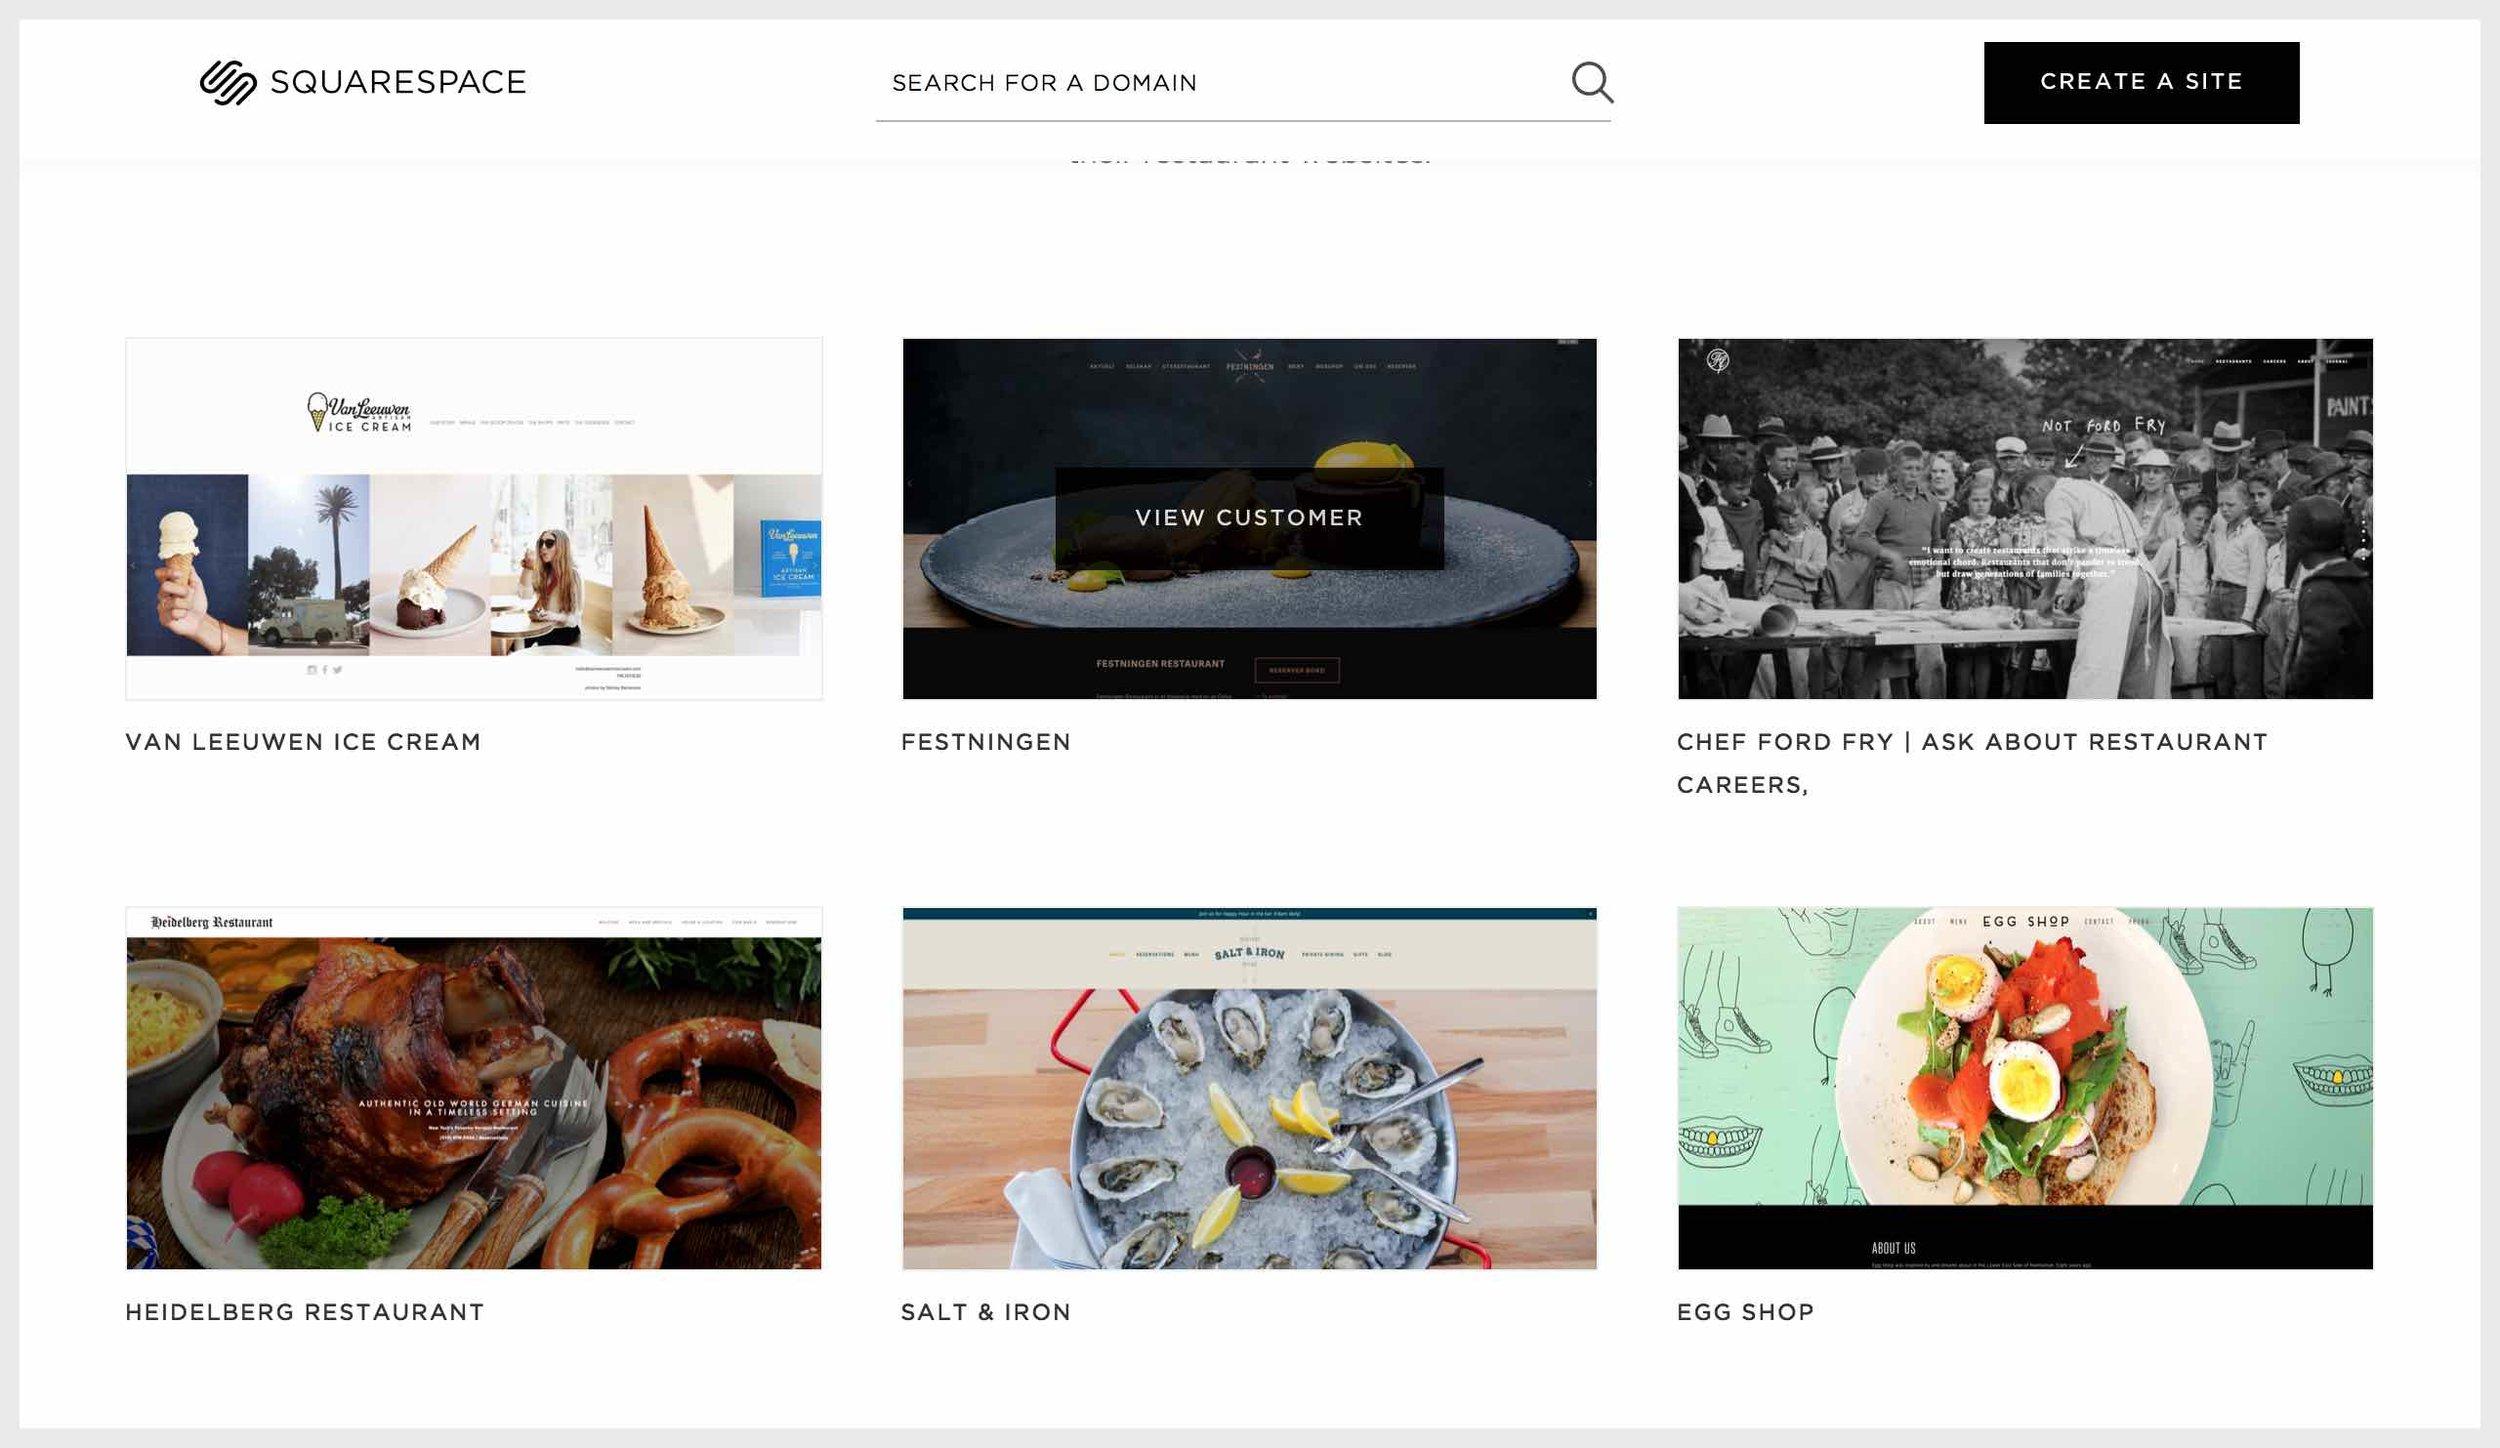 Squarespace's customer websites